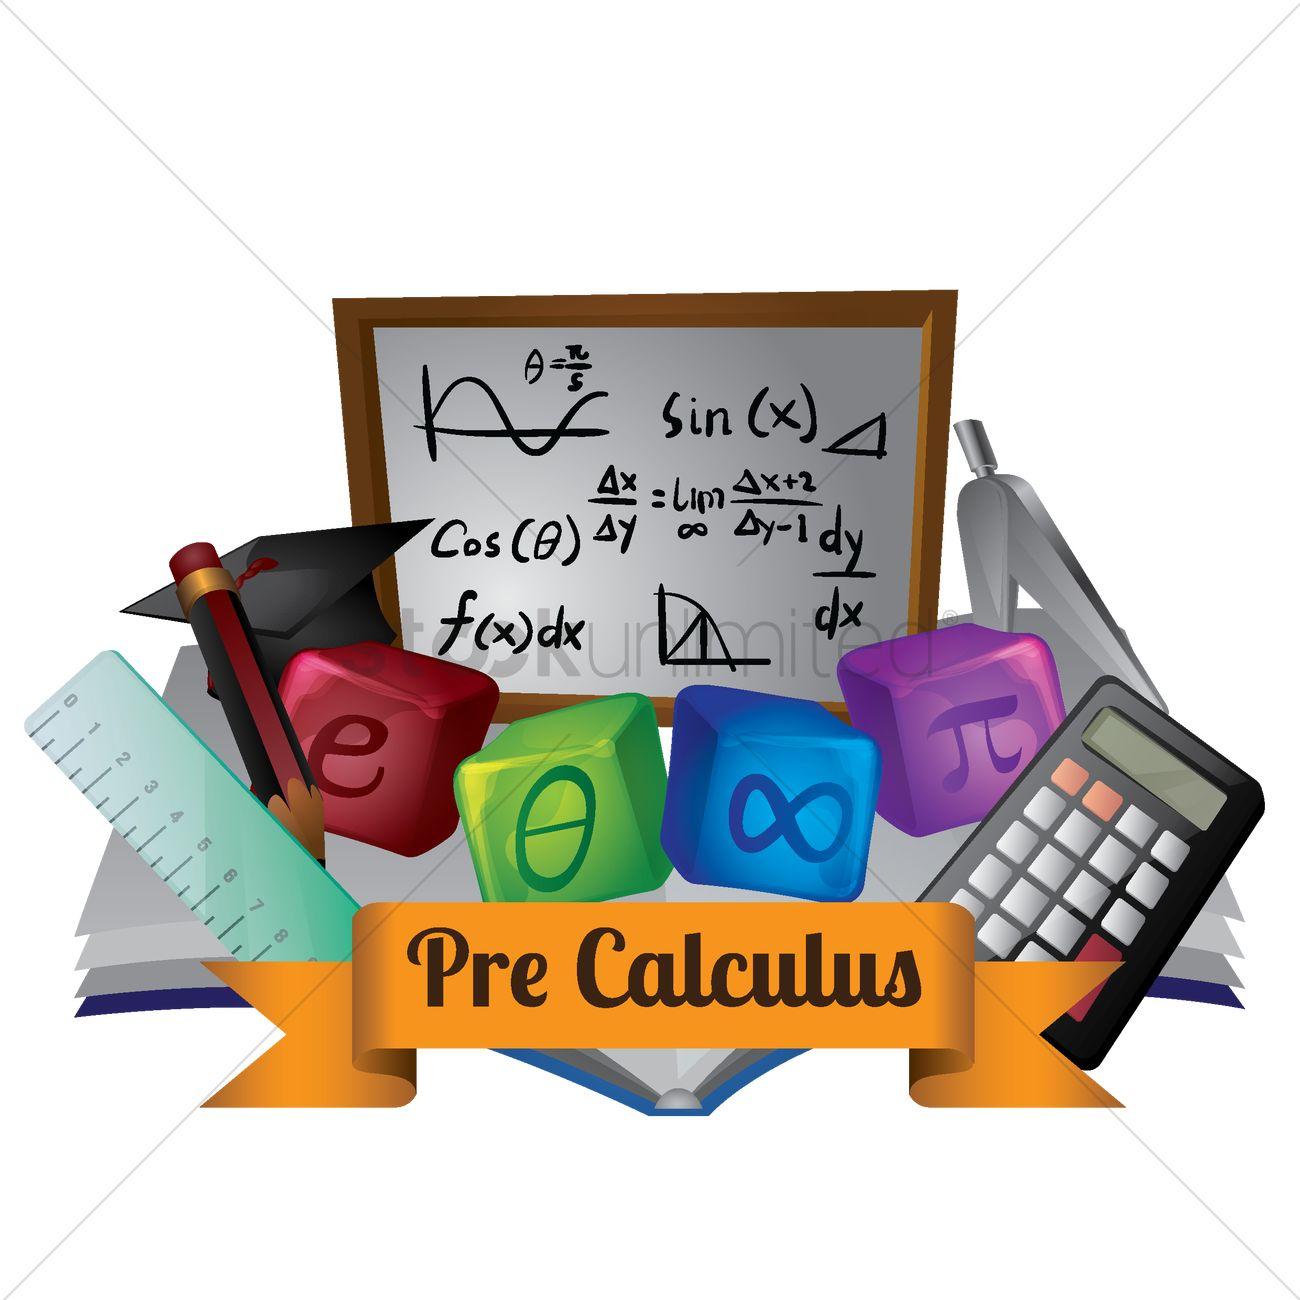 Precalculus concept Vector Image - 2004114 | StockUnlimited